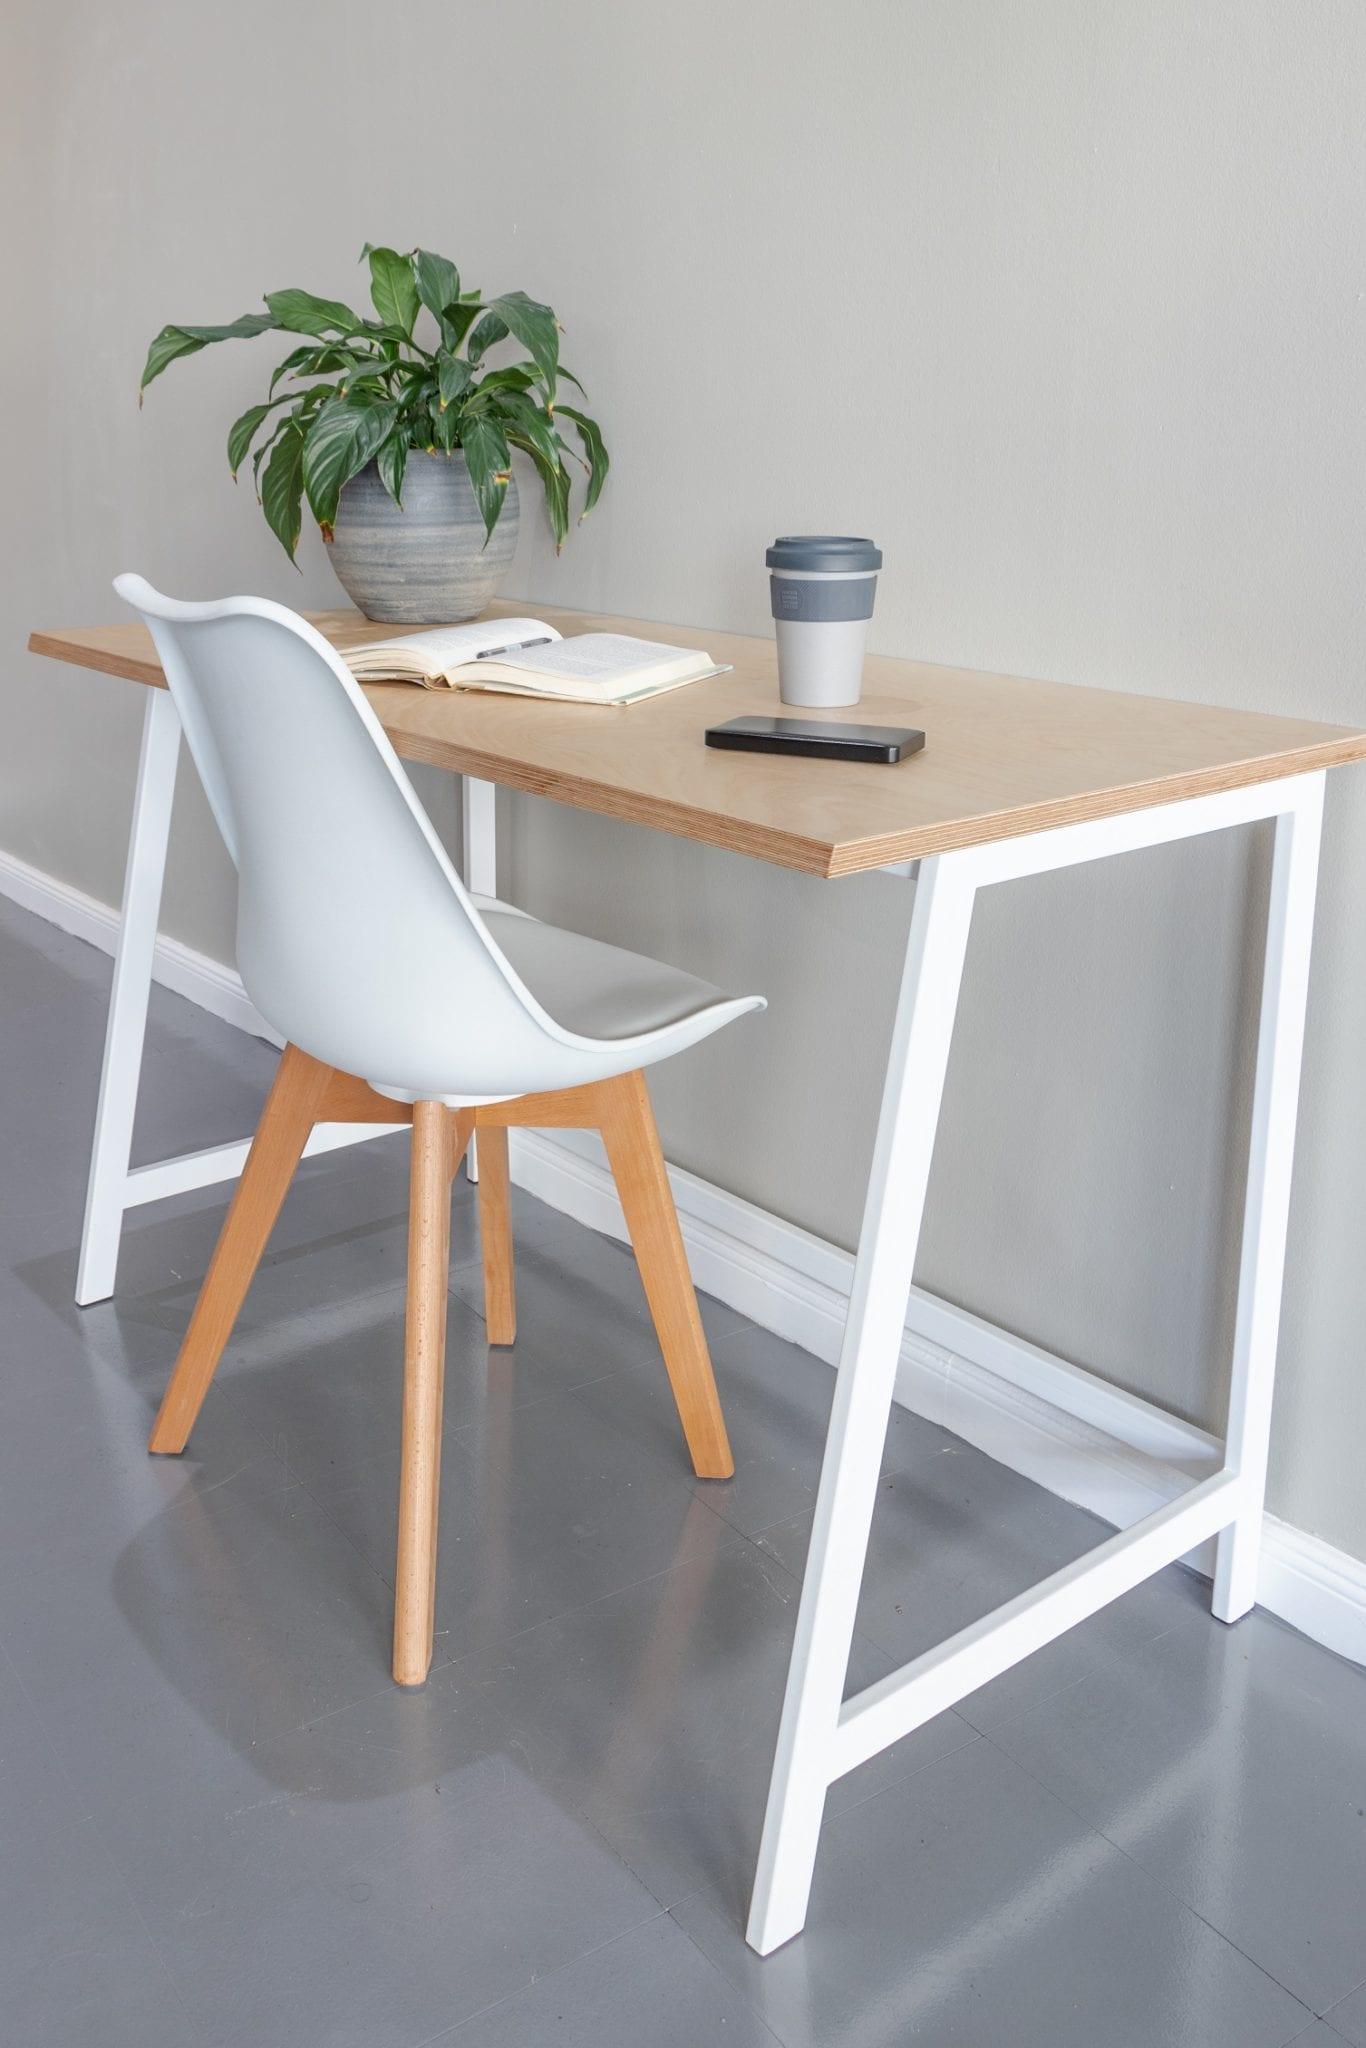 Desks & Dressers Speedi Steel Frame Desk Desks